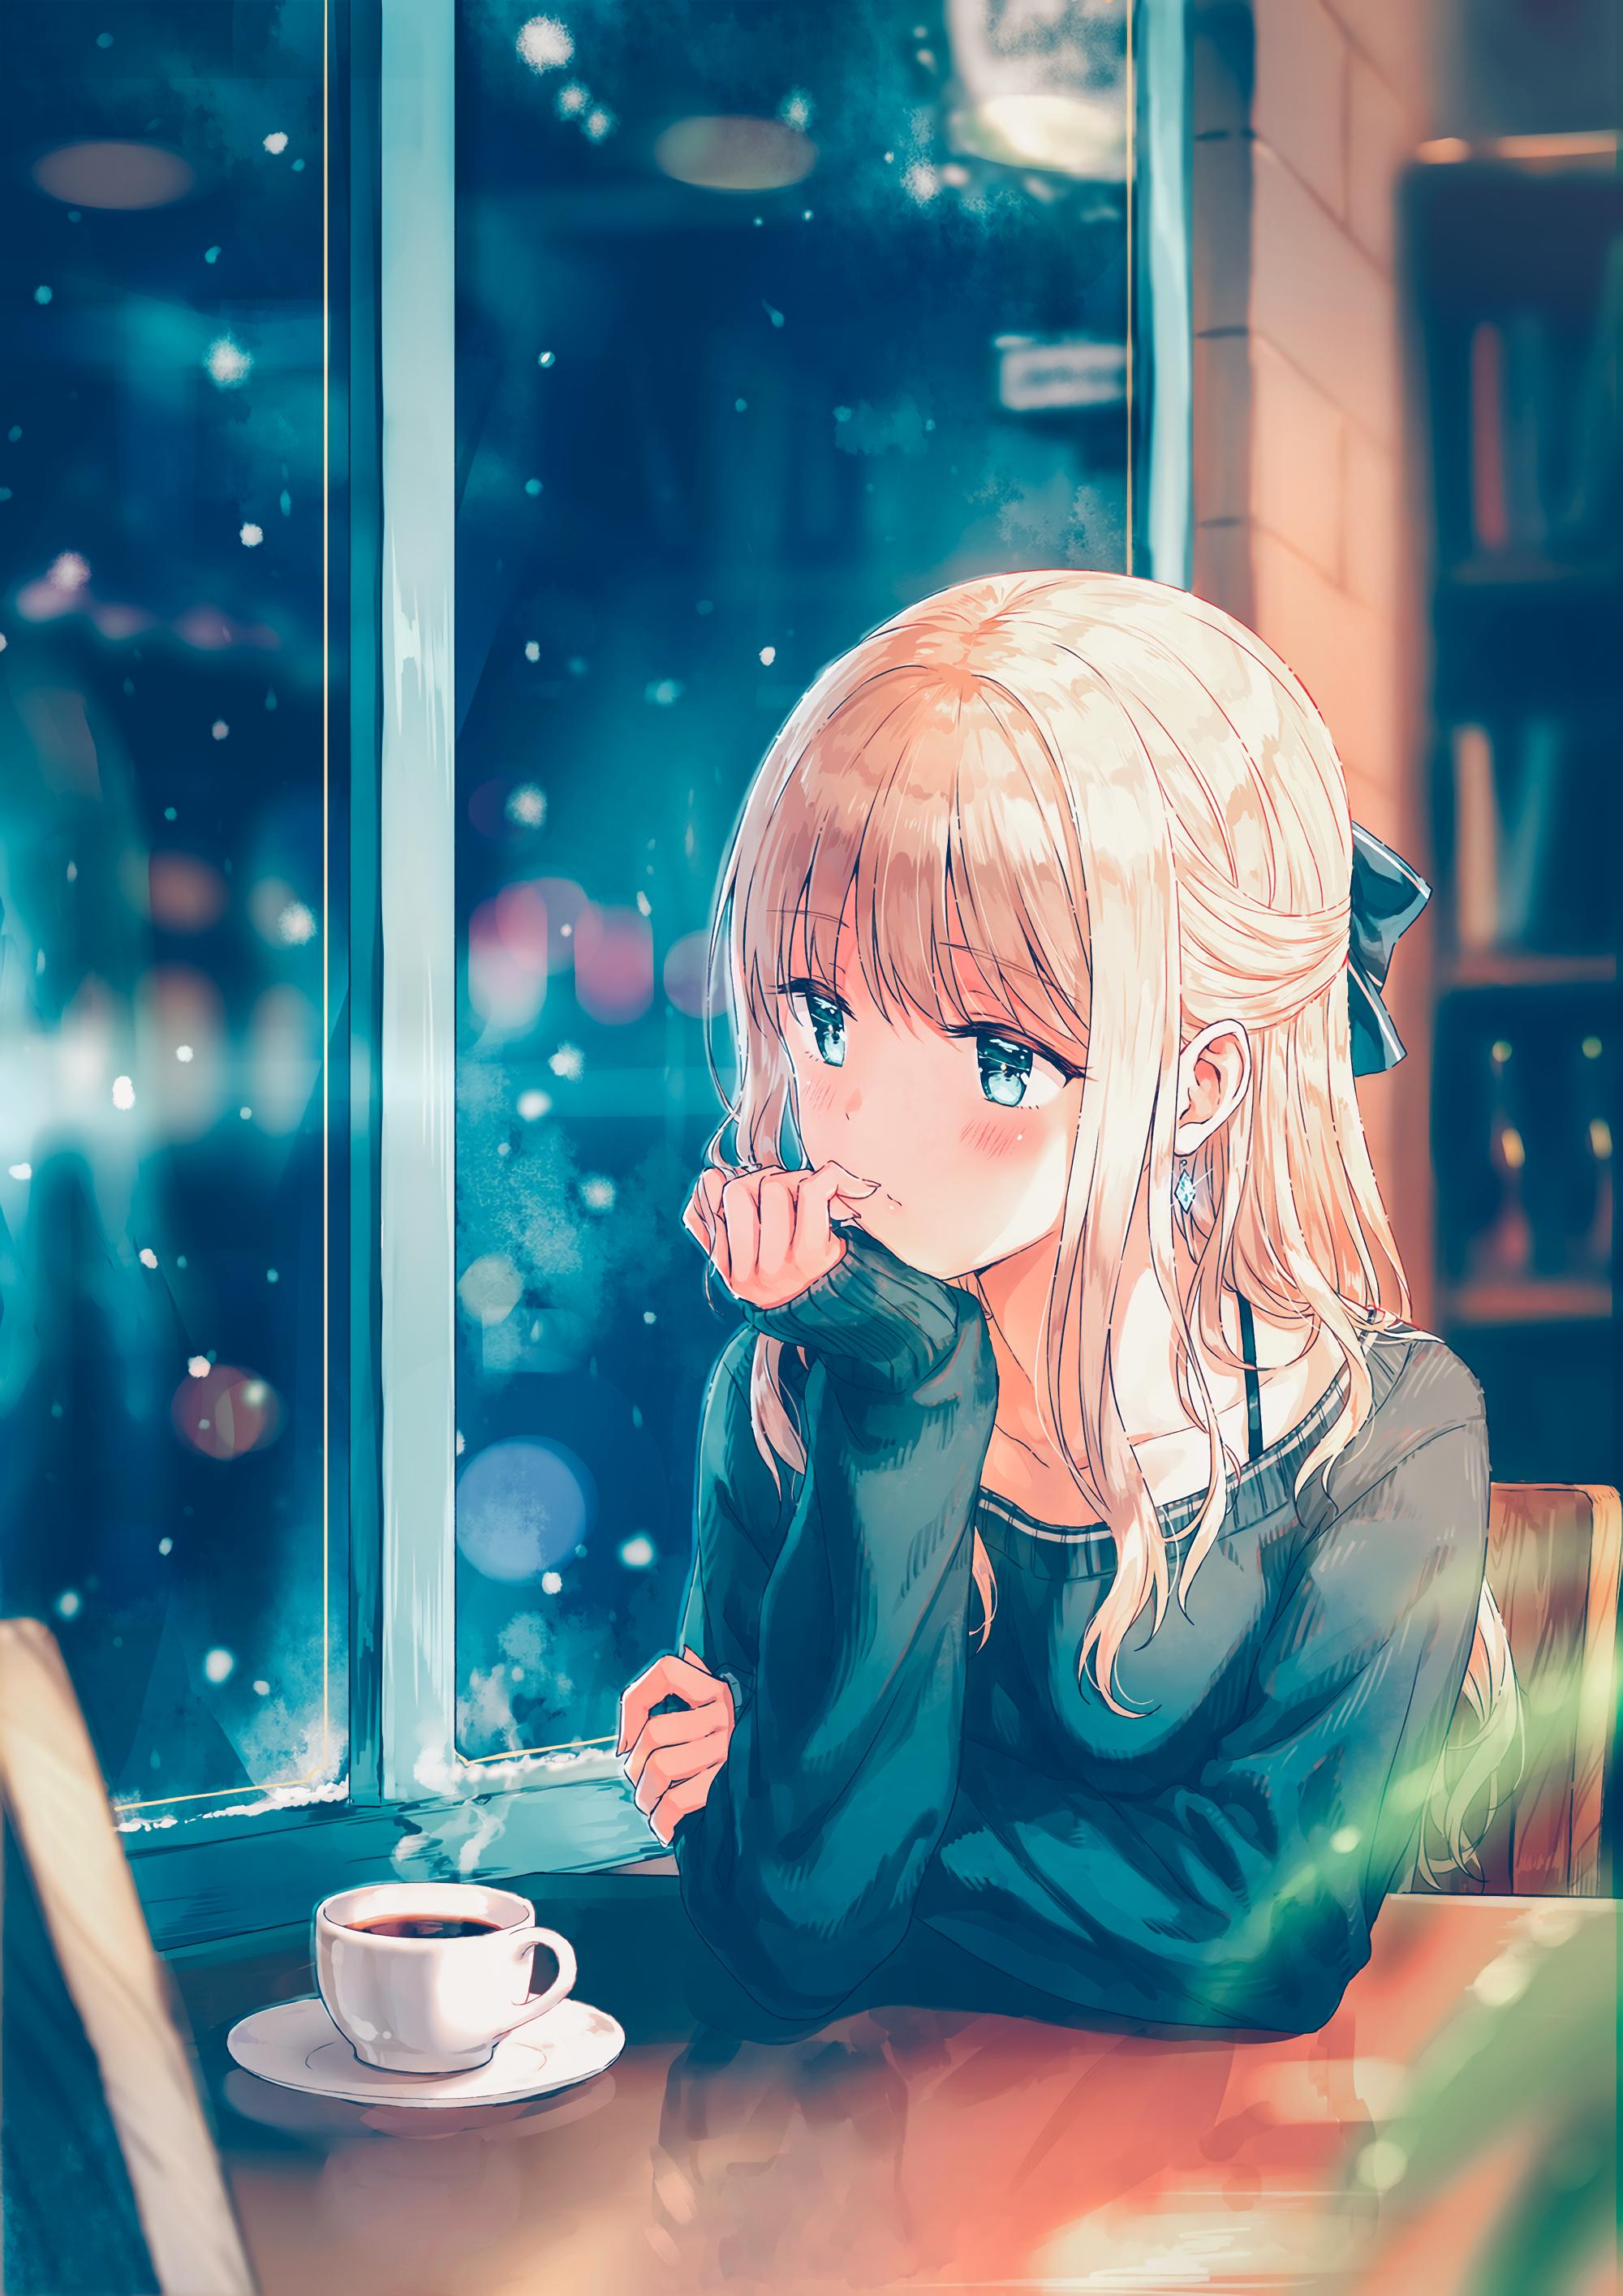 Cute anime girl with blonde hair